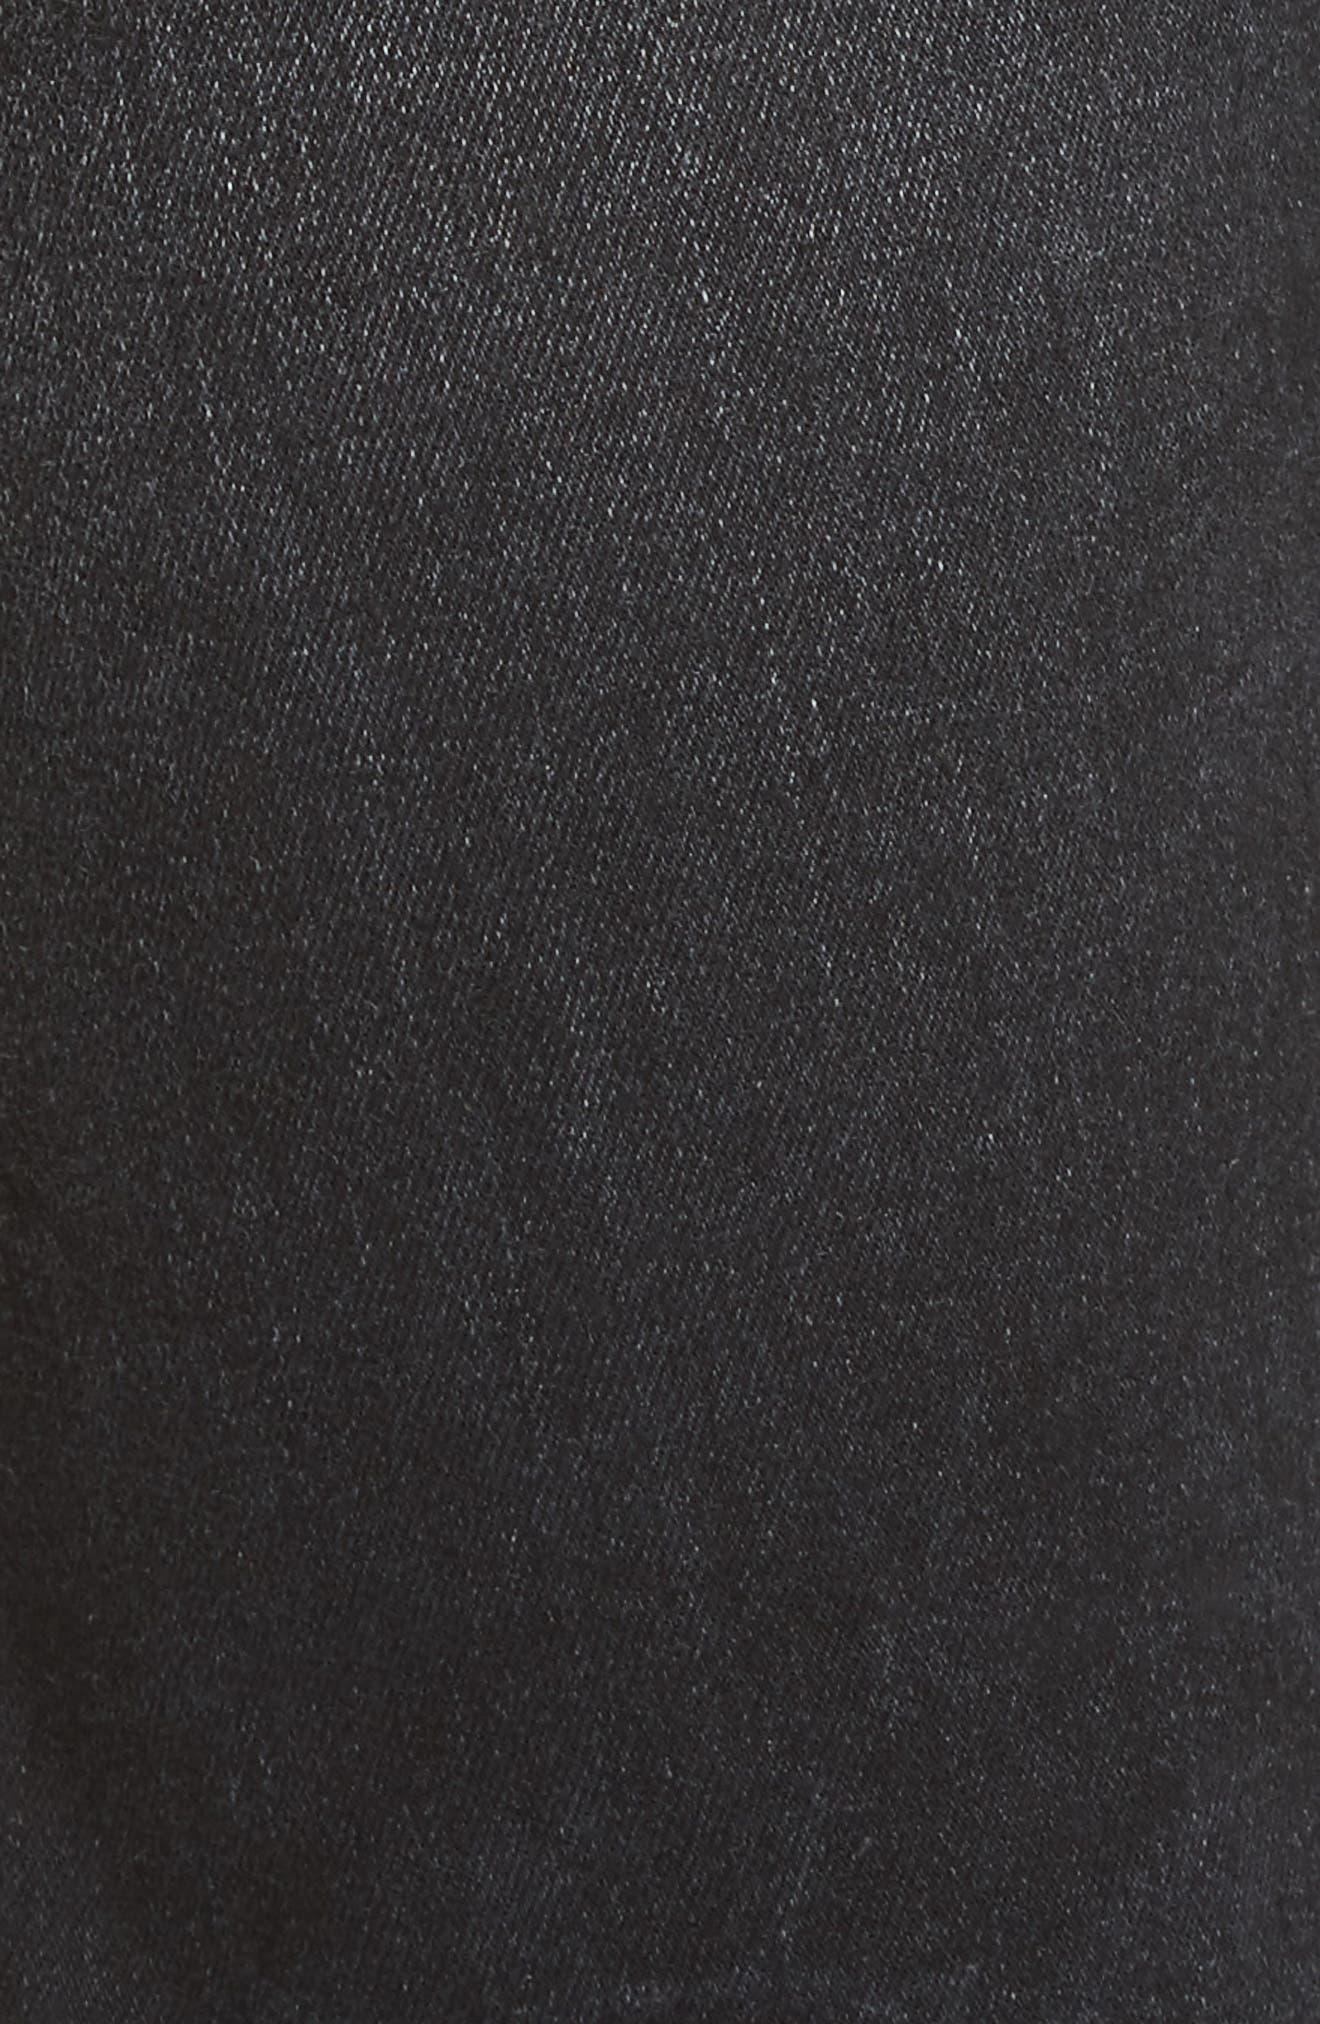 Skate Jeans,                             Alternate thumbnail 5, color,                             BLACK MARBLE